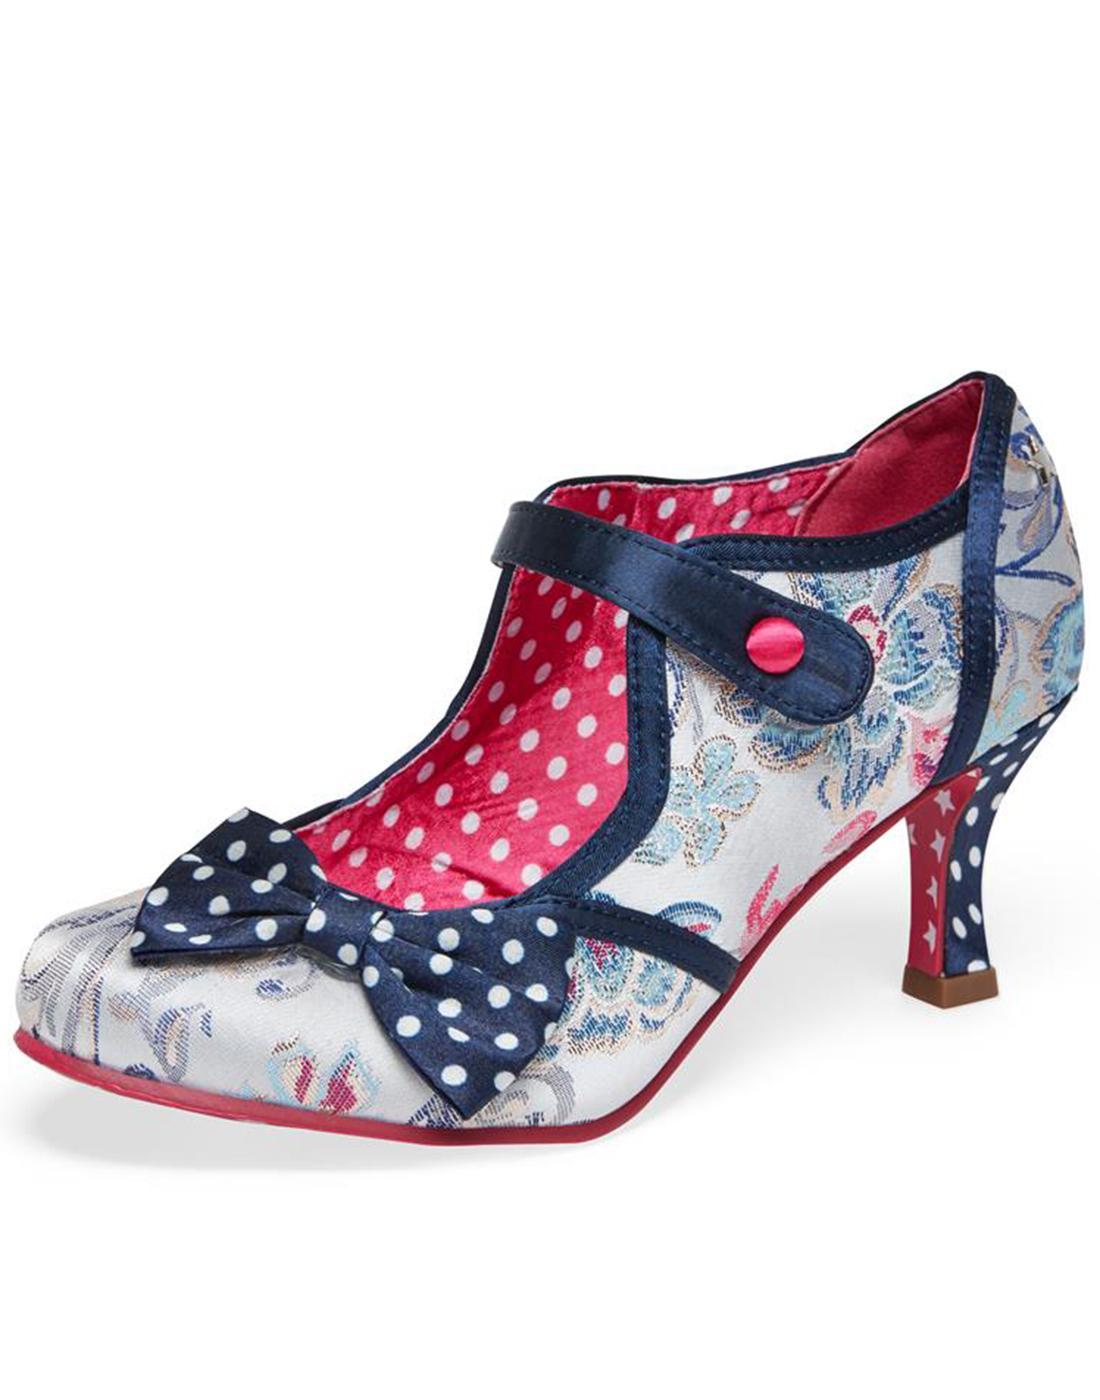 Clara JOE BROWNS 1950s Vintage Bow Bar Heels